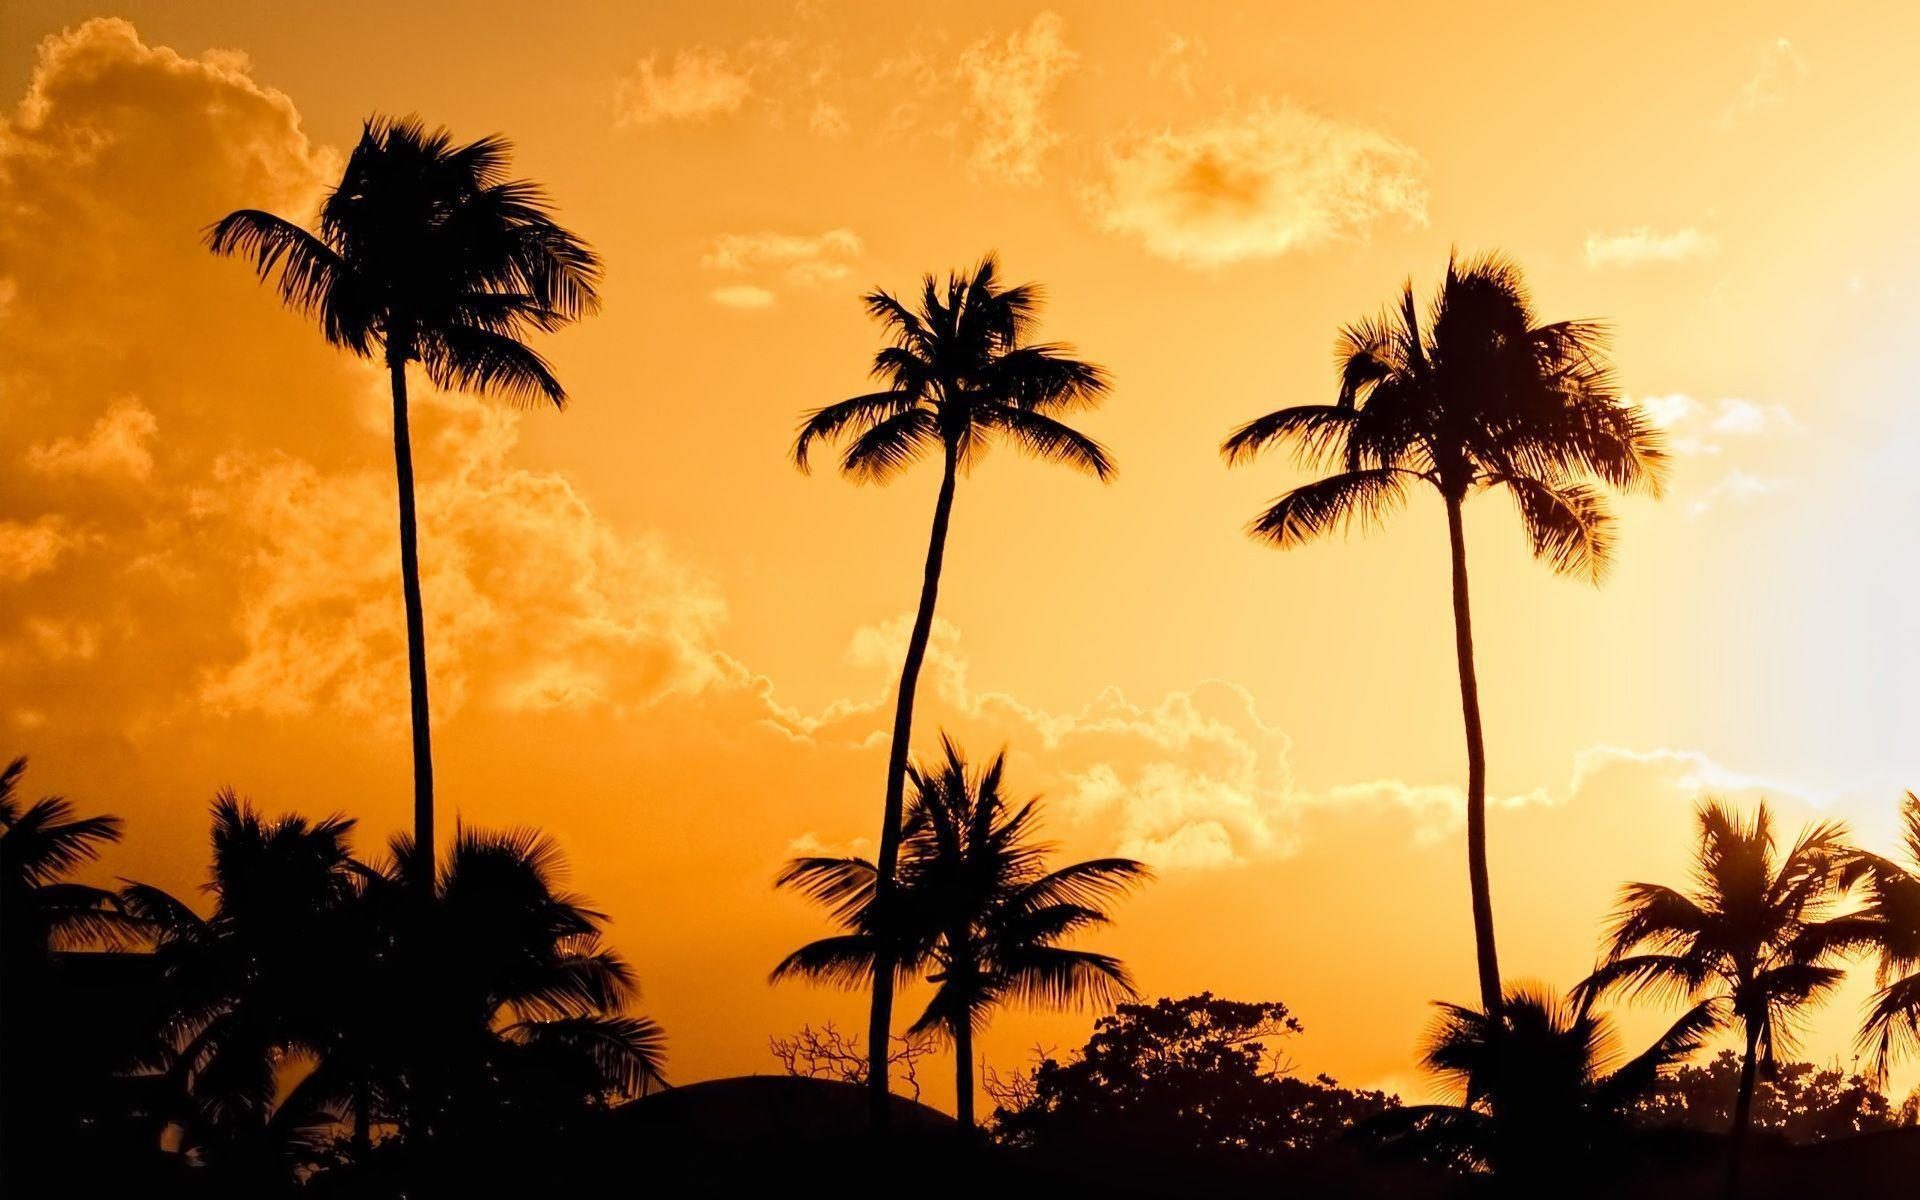 stussy wallpaper palm trees - photo #22